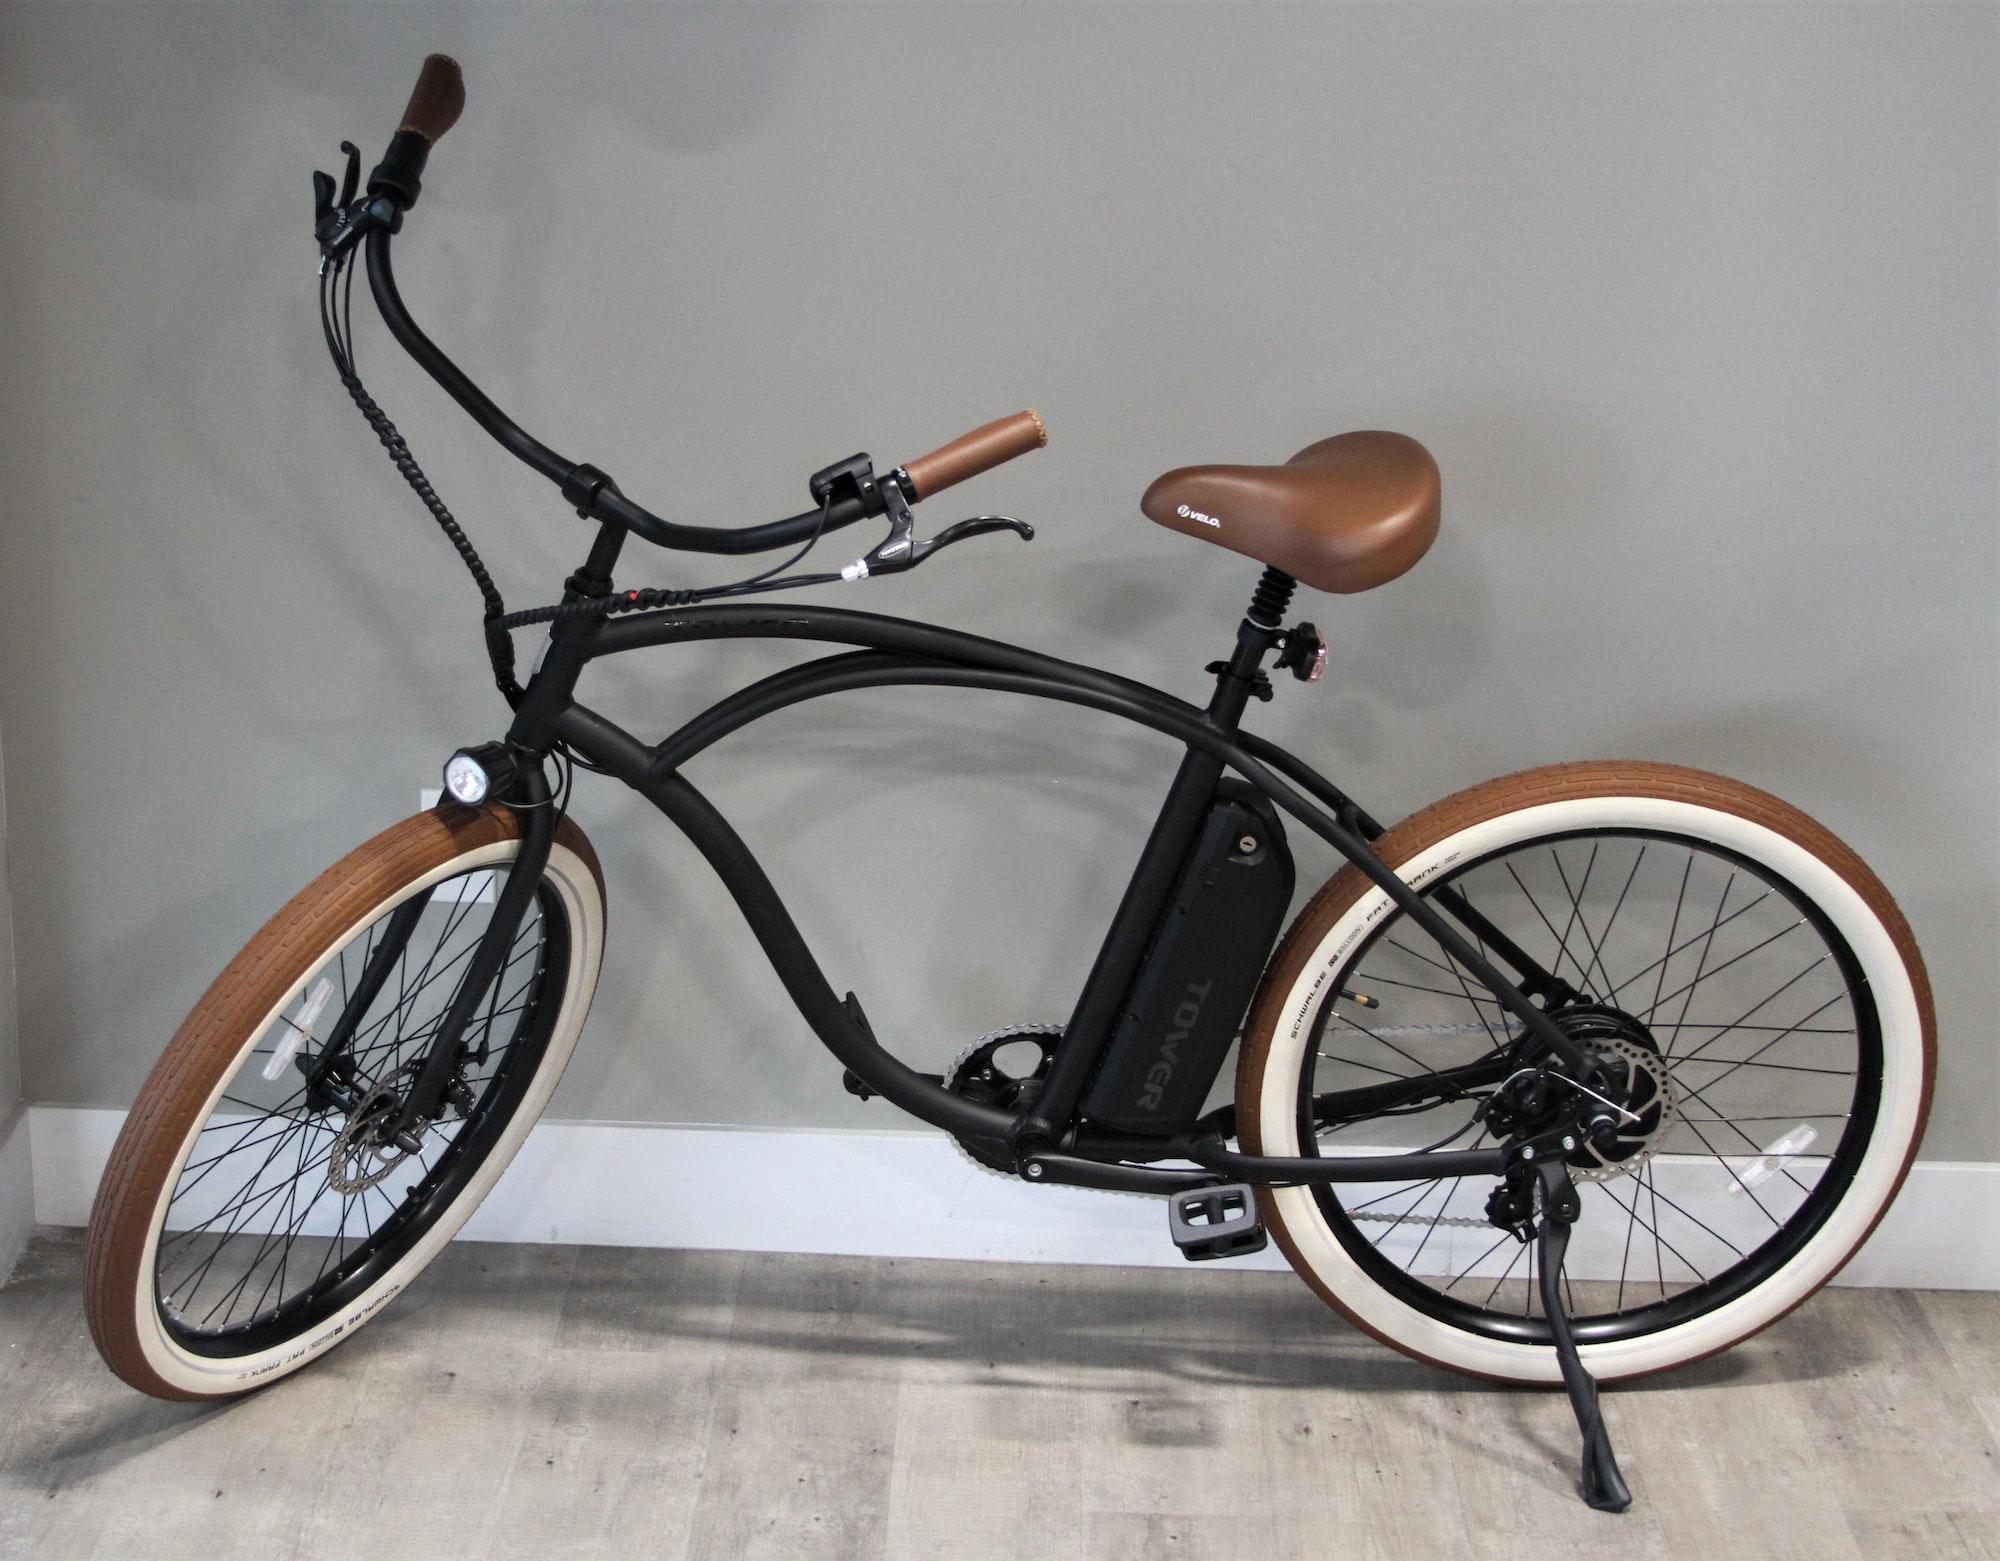 Tower electric bike.